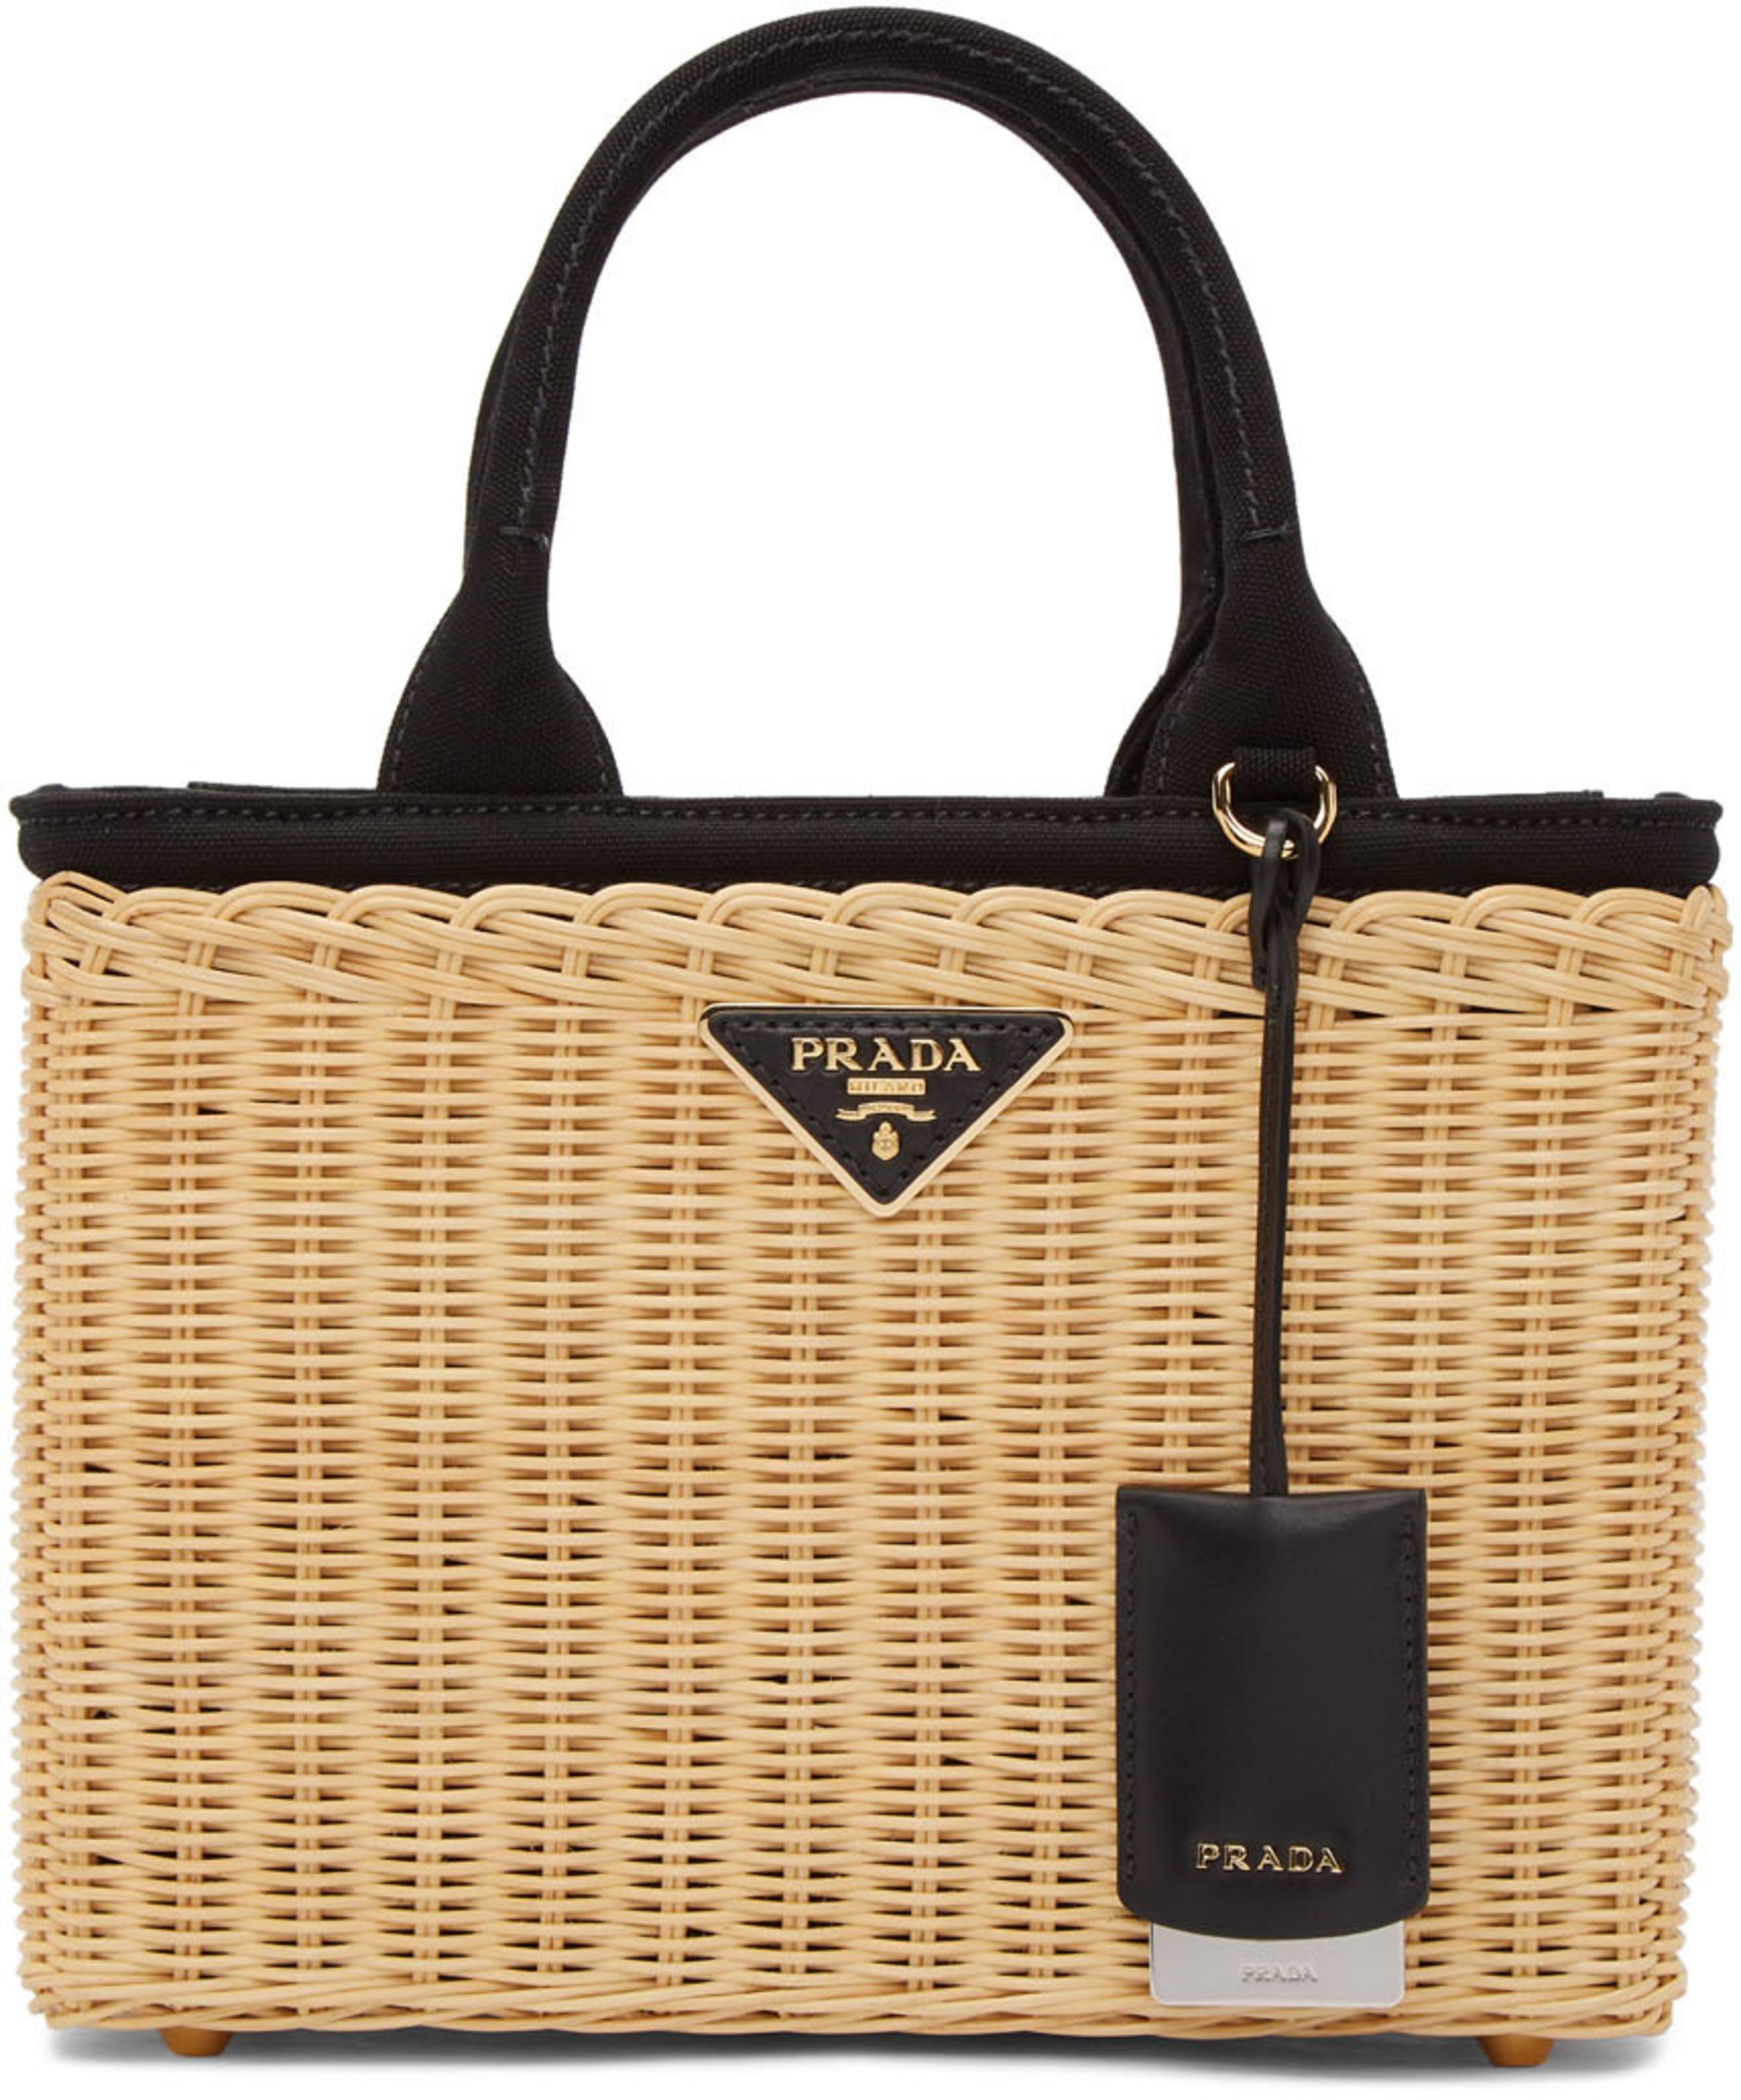 8c20ab2f8ae2 Prada bags for Women | SSENSE Canada